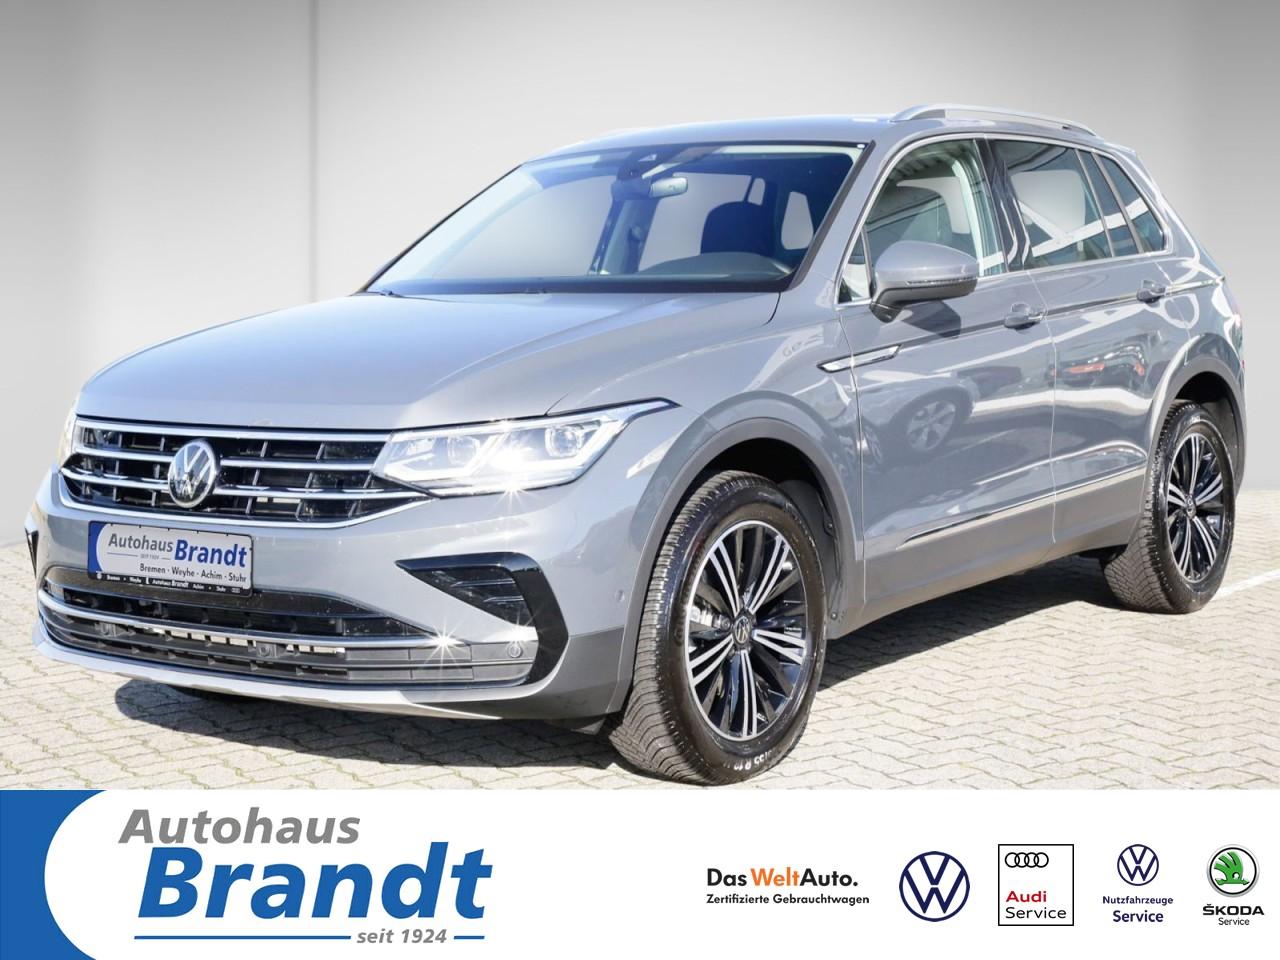 Volkswagen Tiguan 2.0 TDI Elegance DSG*MATRIX*4M*ACC*KAMERA*DC, Jahr 2021, Diesel